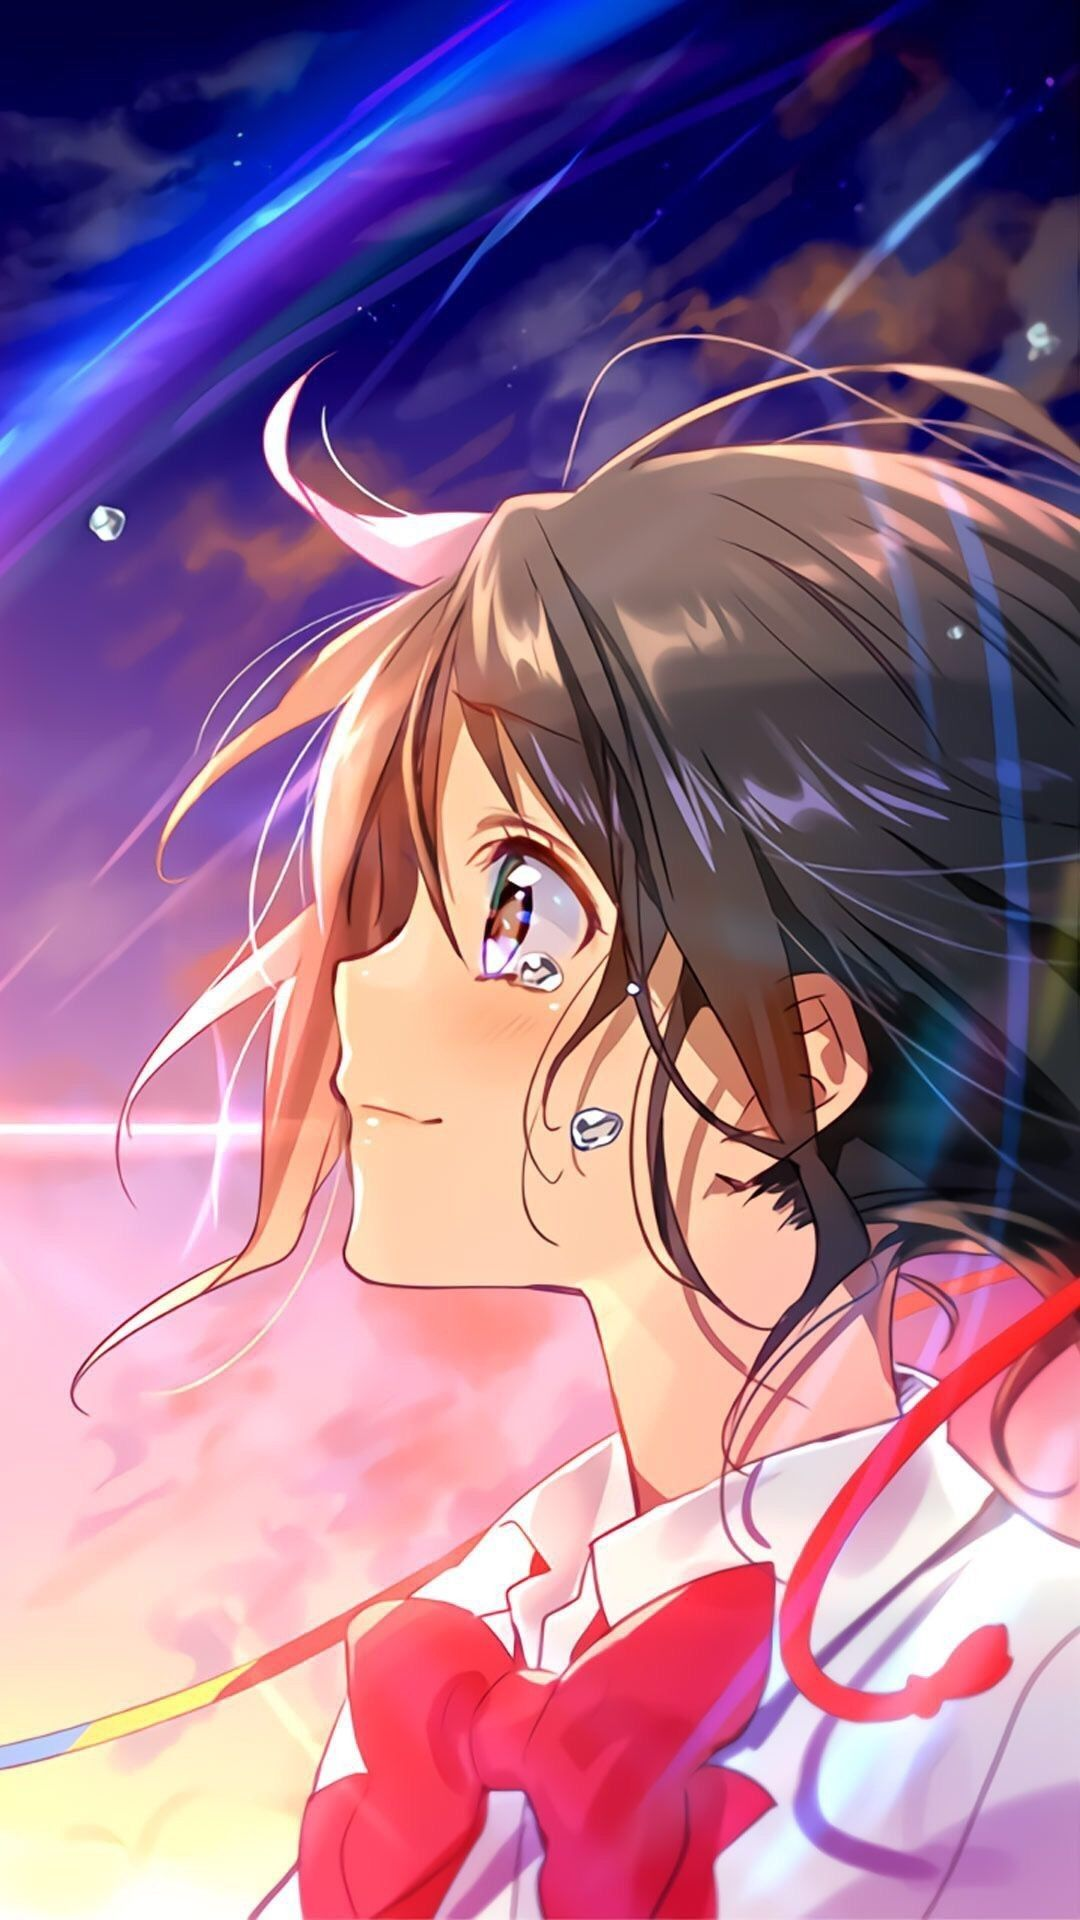 Pin de Psycho Bunnie em Anime Anime chibi, Anime kawaii